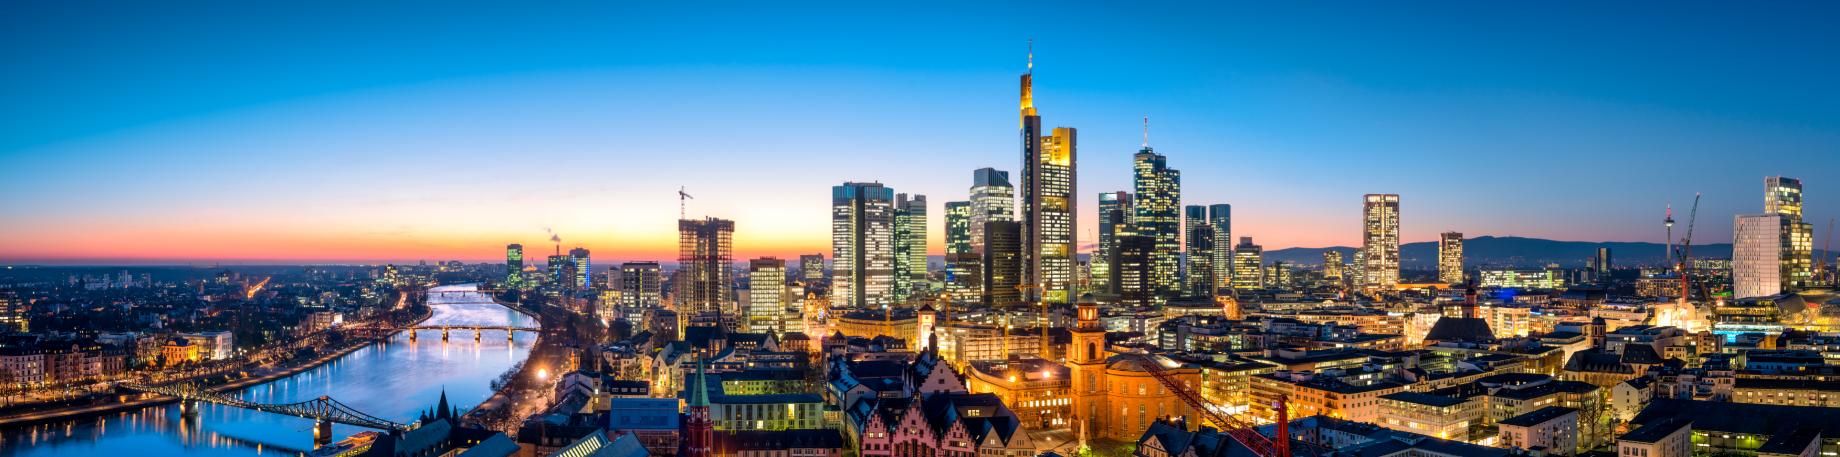 Unternehmensberatung Frankfurt